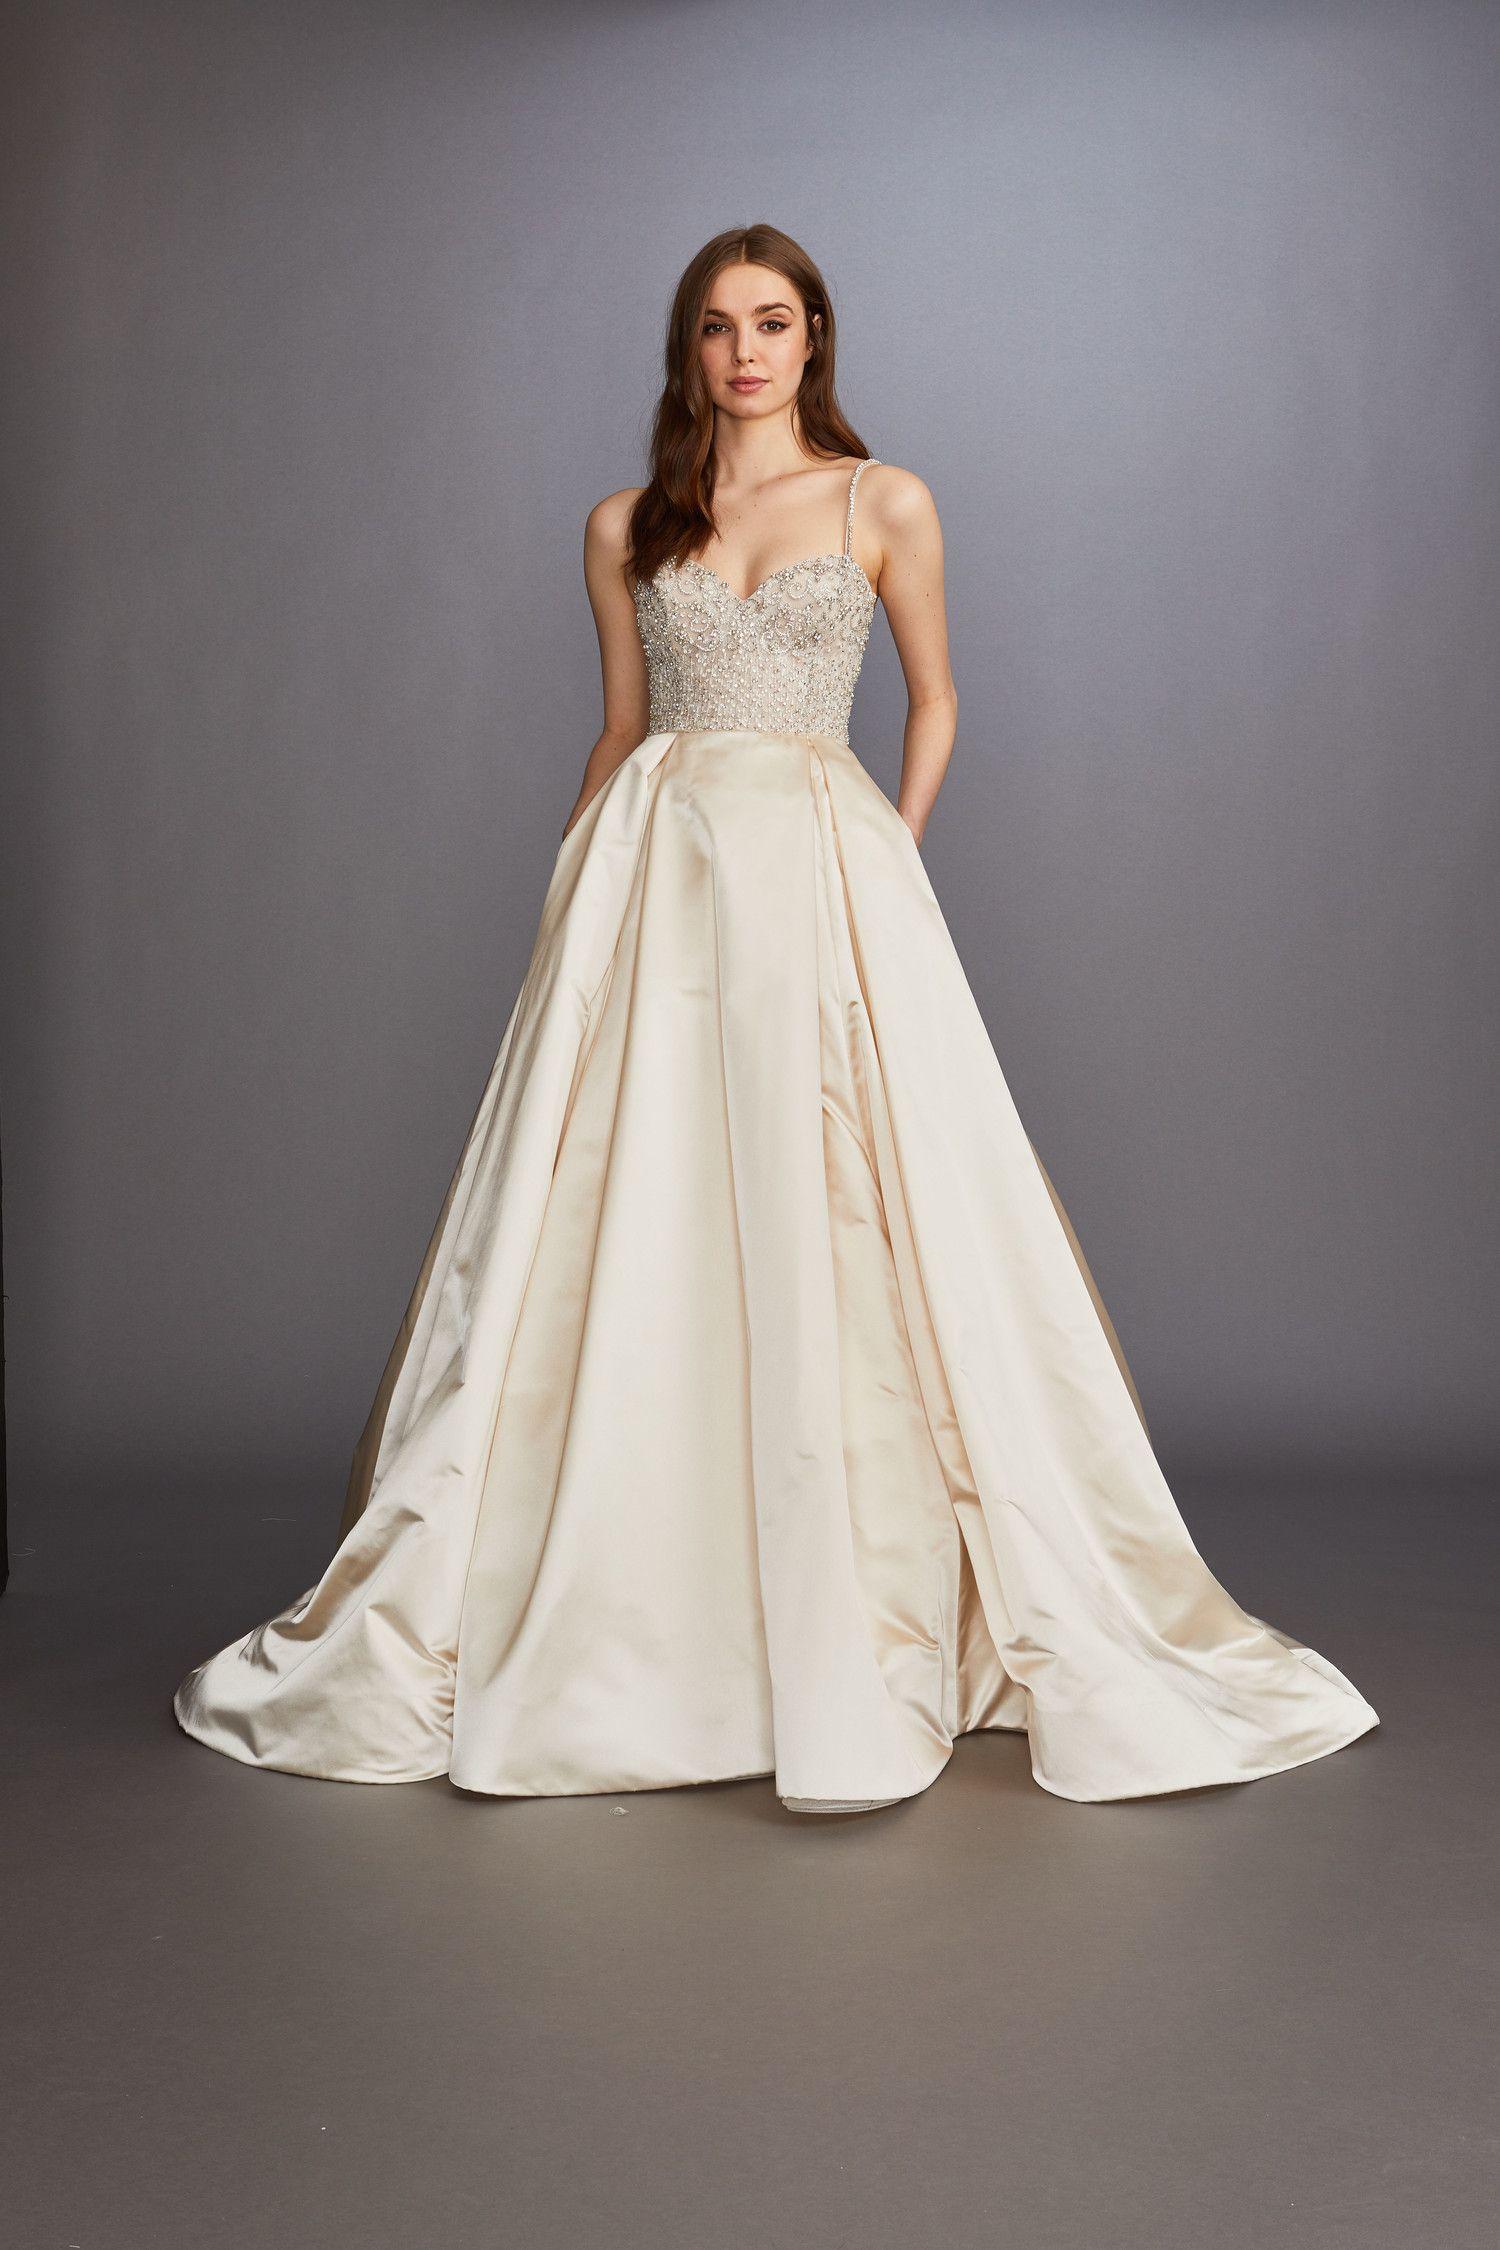 Wedding Dress By Lazaro Wedding Dresses Wedding Dress With Pockets Wedding Dresses Satin